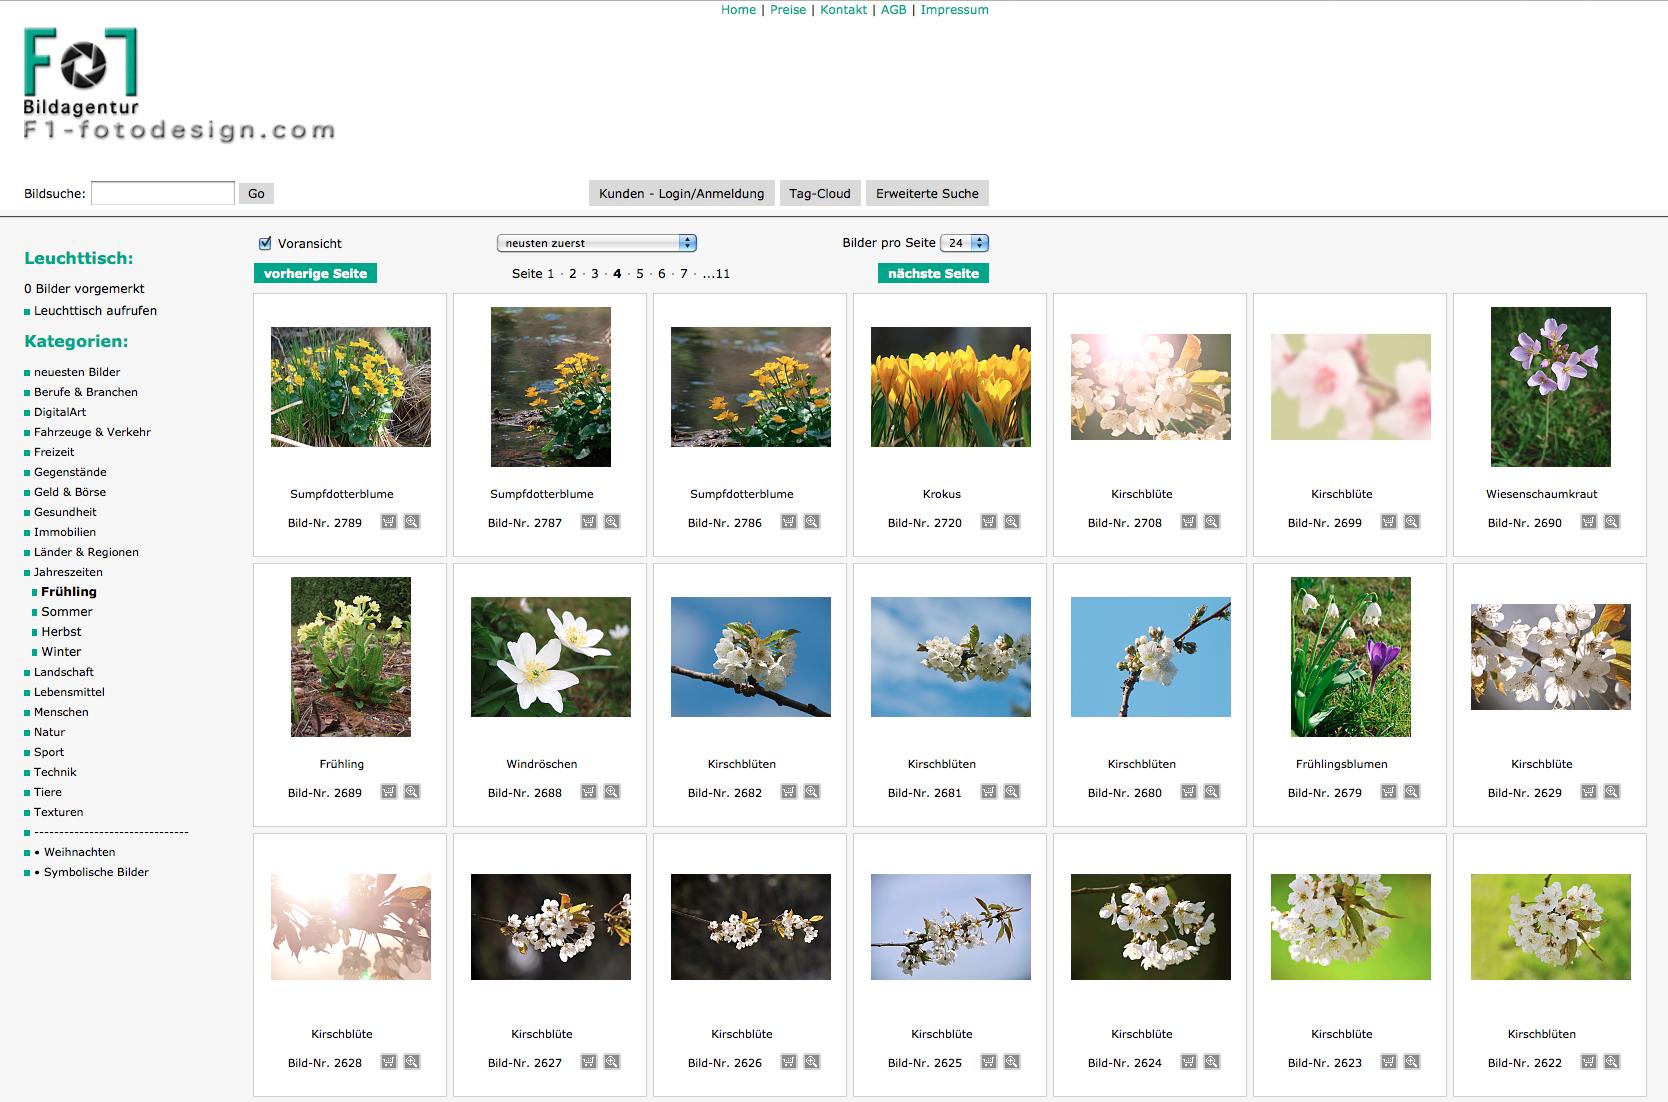 Bildagentur mit Frühlingsmotiven 2016